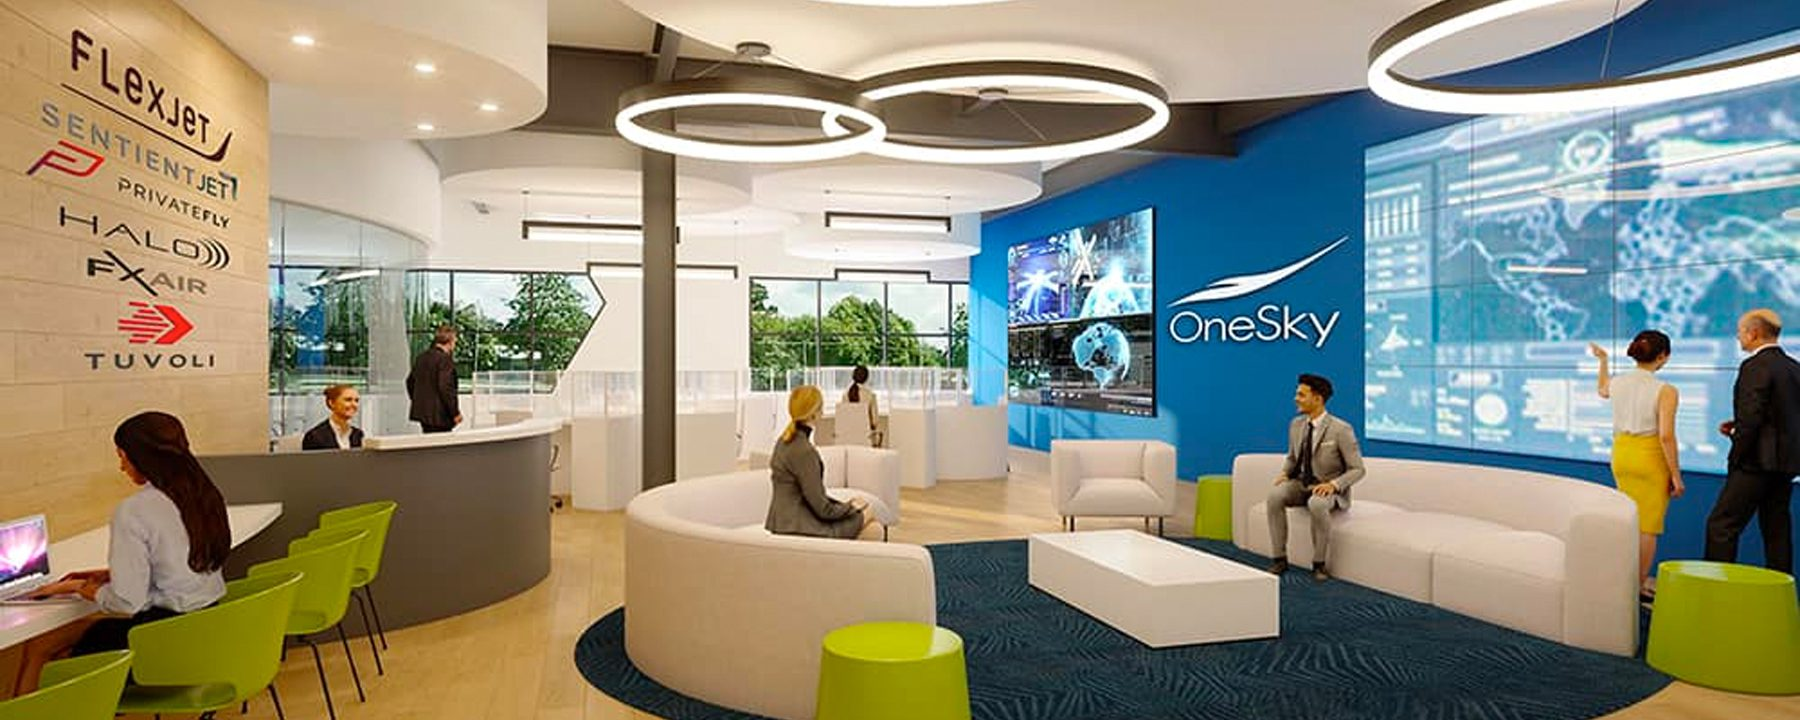 OneSky Flight Lobby